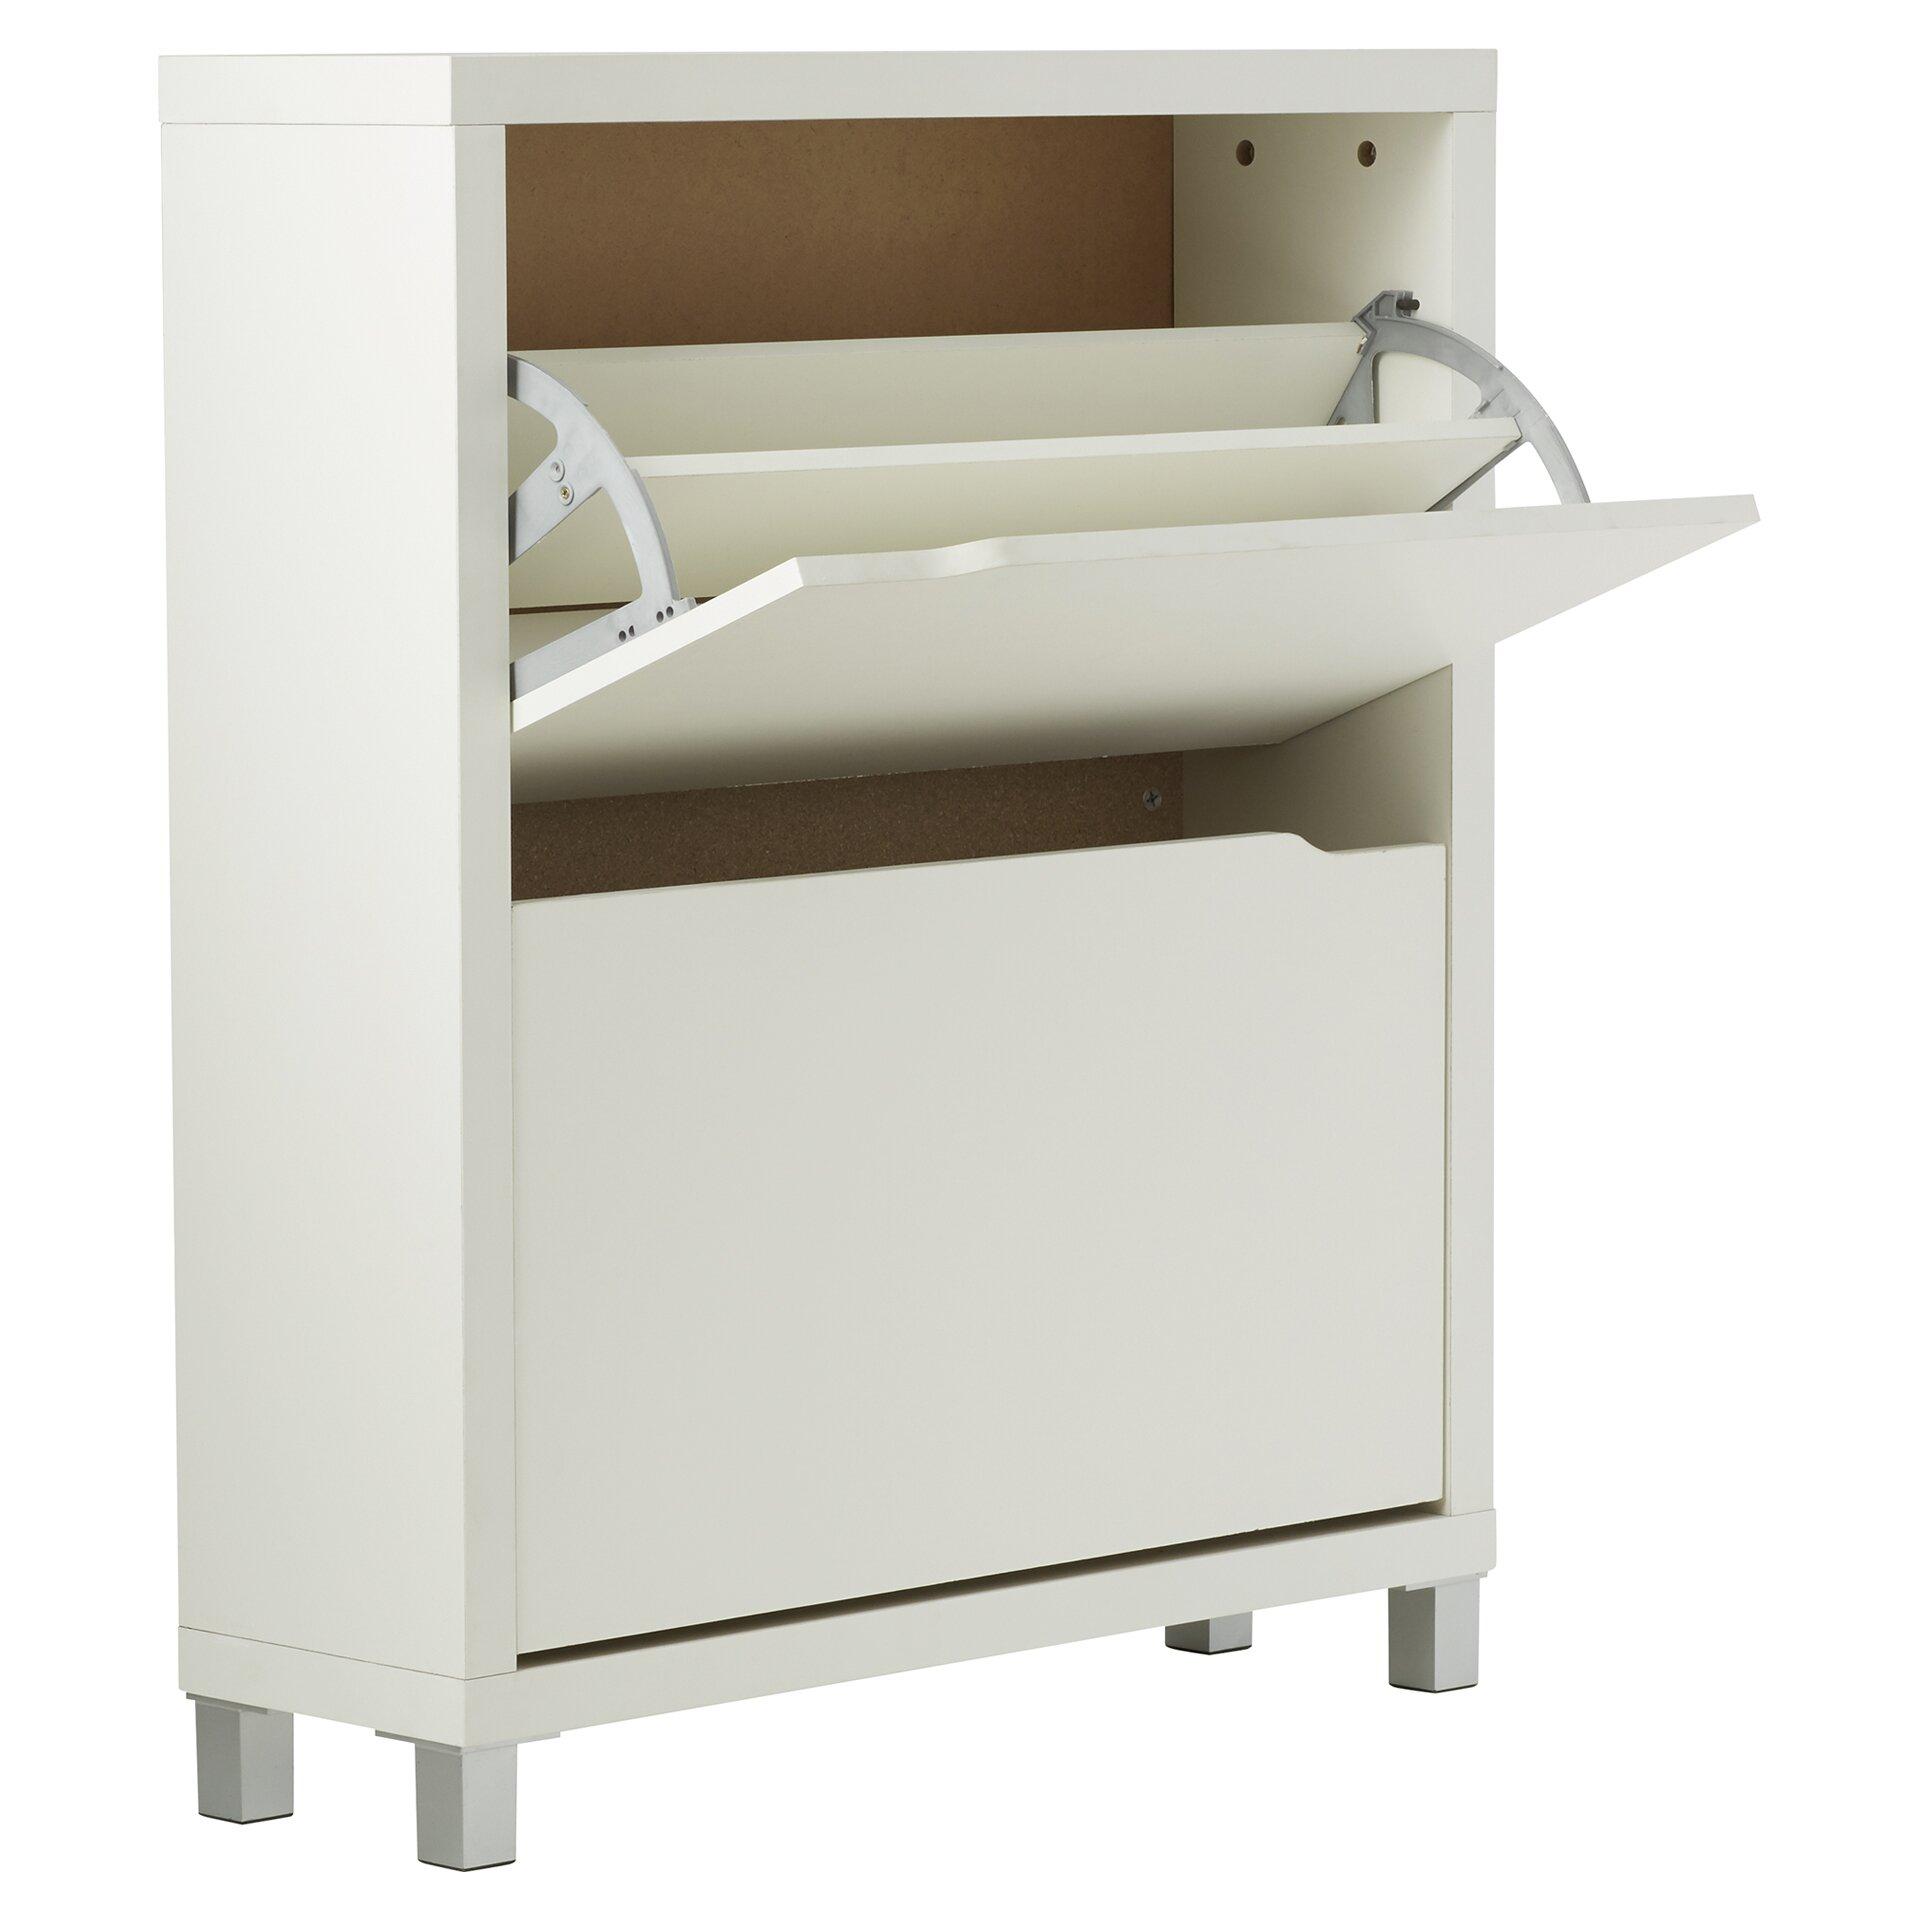 12 pair white shoe storage cabinet reviews allmodern. Black Bedroom Furniture Sets. Home Design Ideas